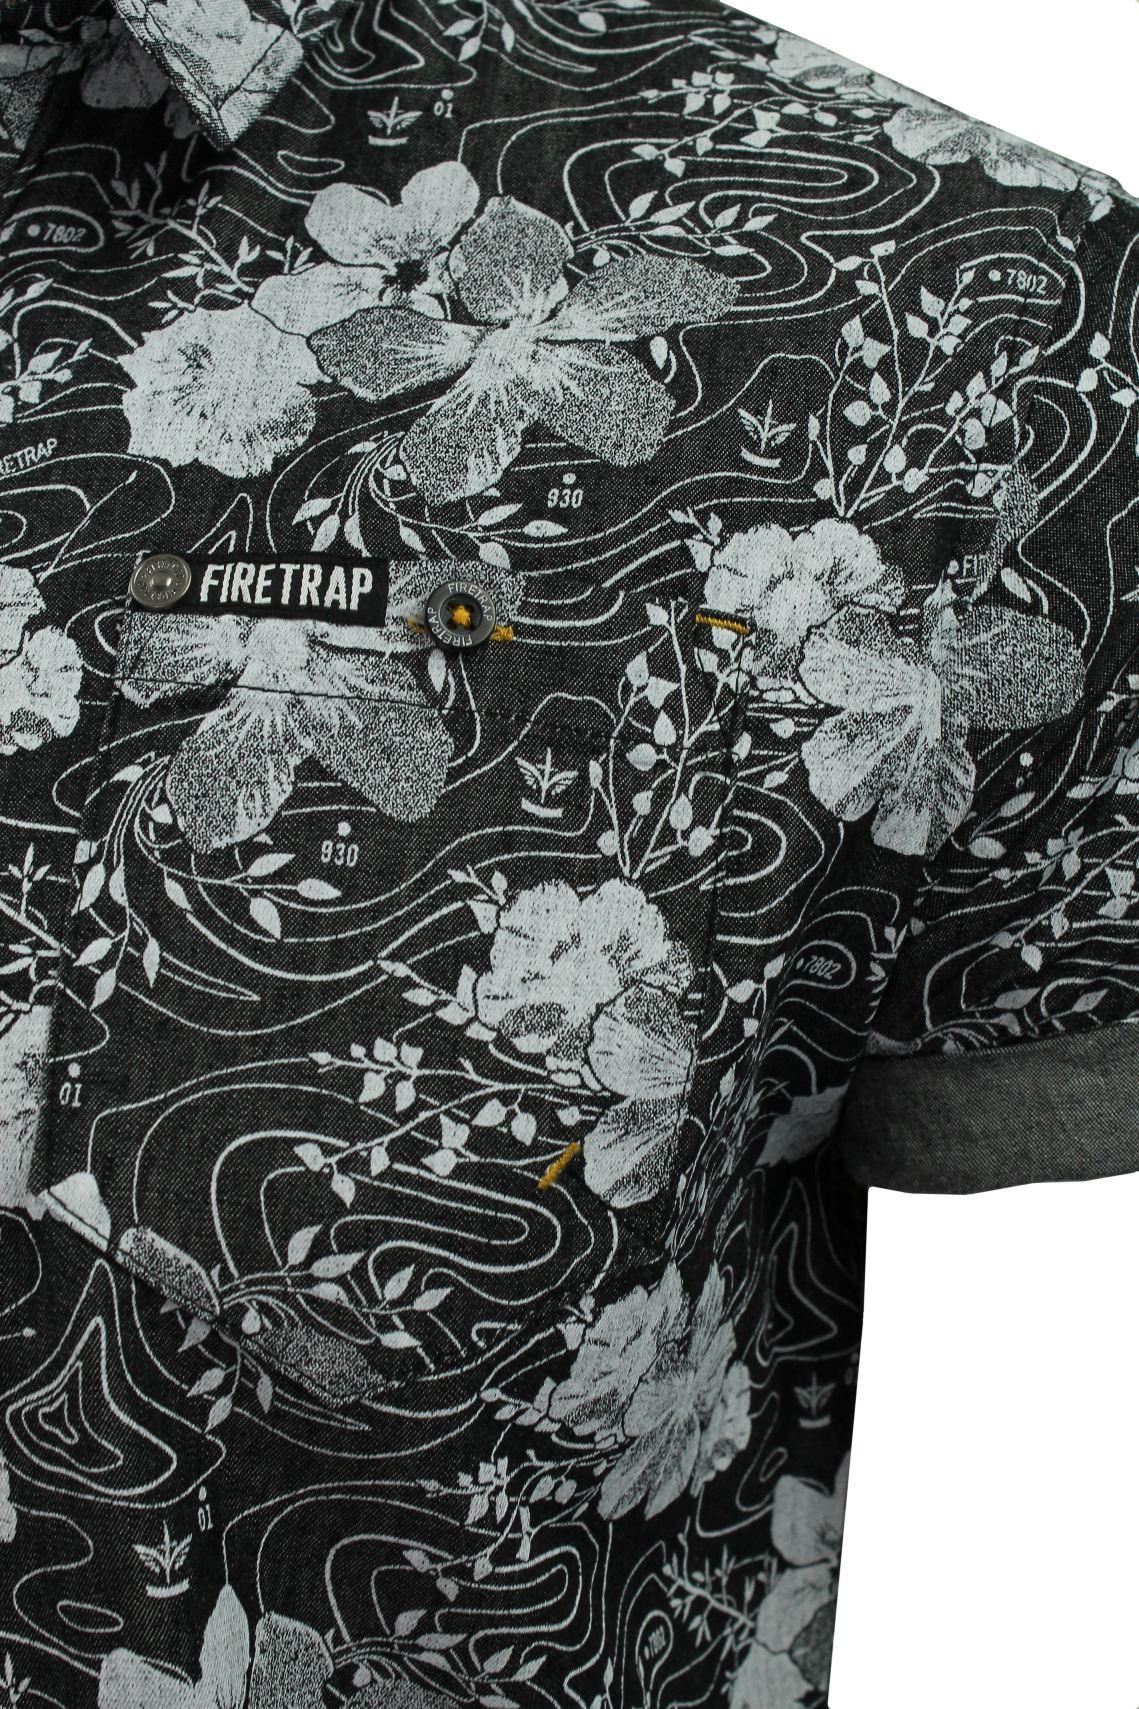 Mens-Short-Sleeved-Shirt-by-Firetrap thumbnail 4